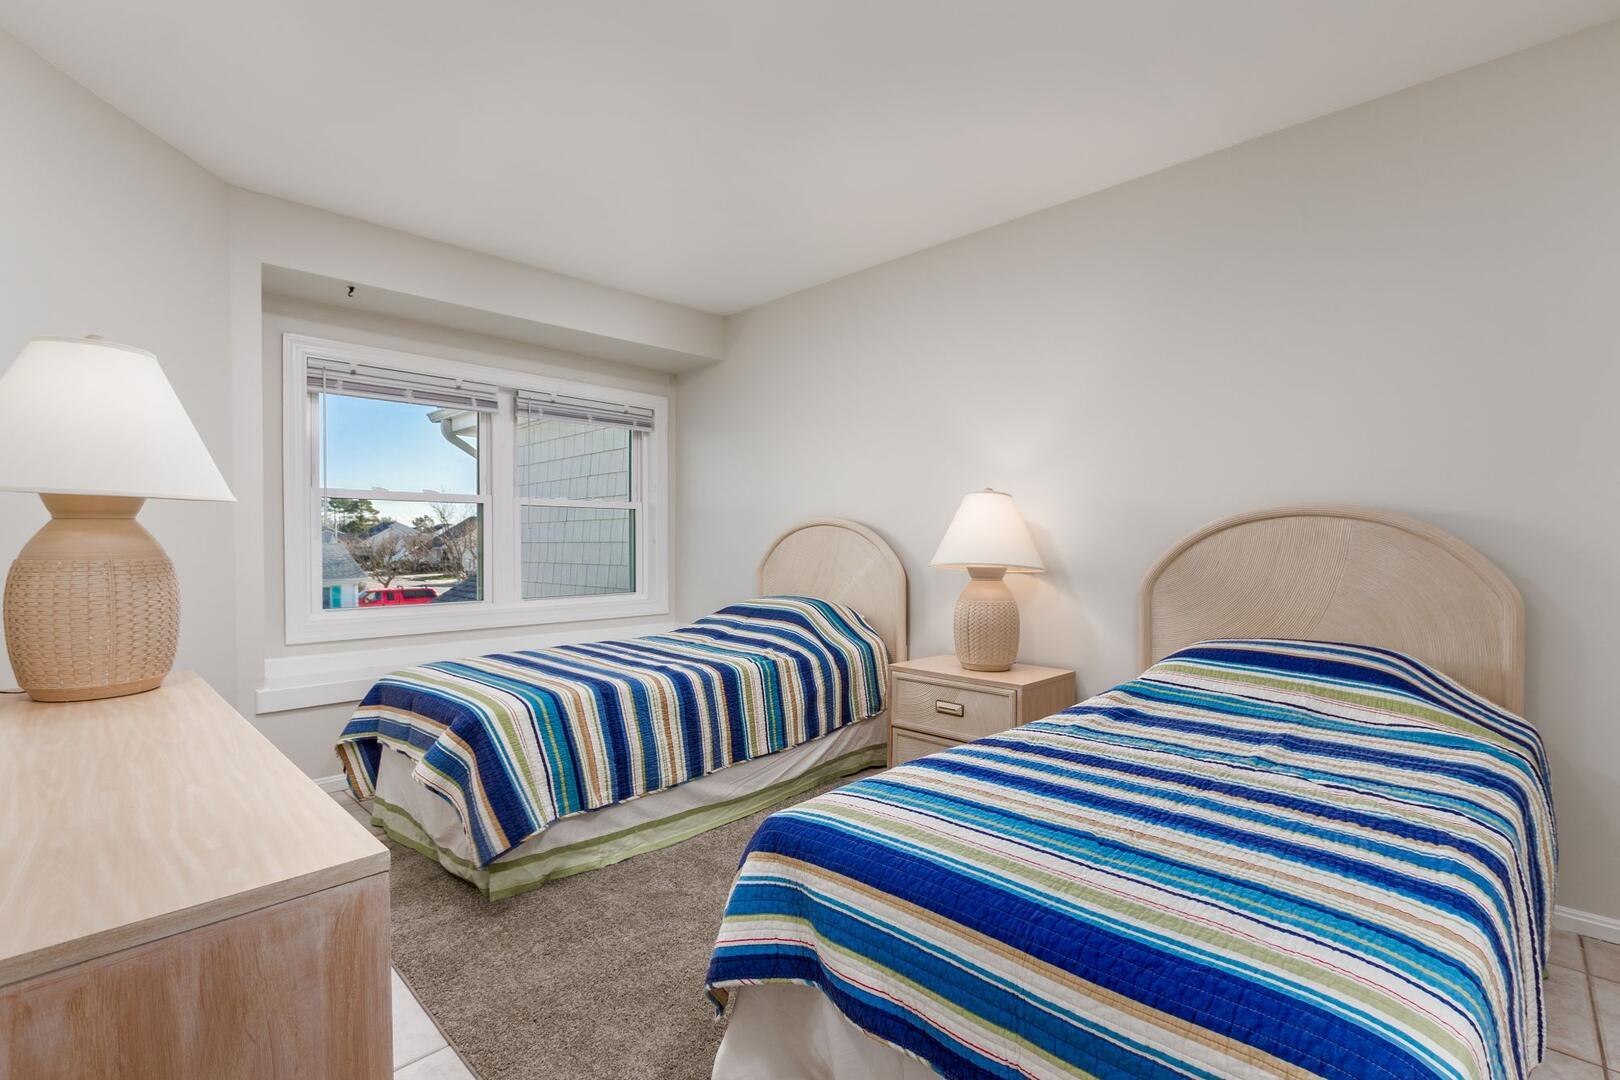 Bedroom 2 of Sunset Harbour 14127B